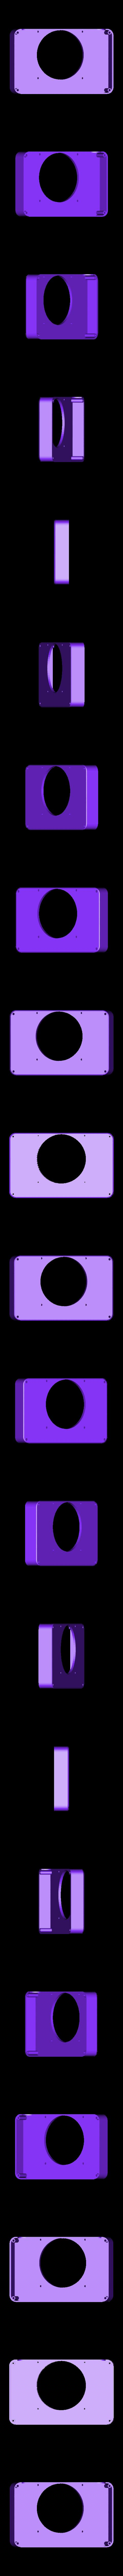 Elbox01.STL Download free STL file Mammut - Giant printer. • 3D printable model, tahustvedt